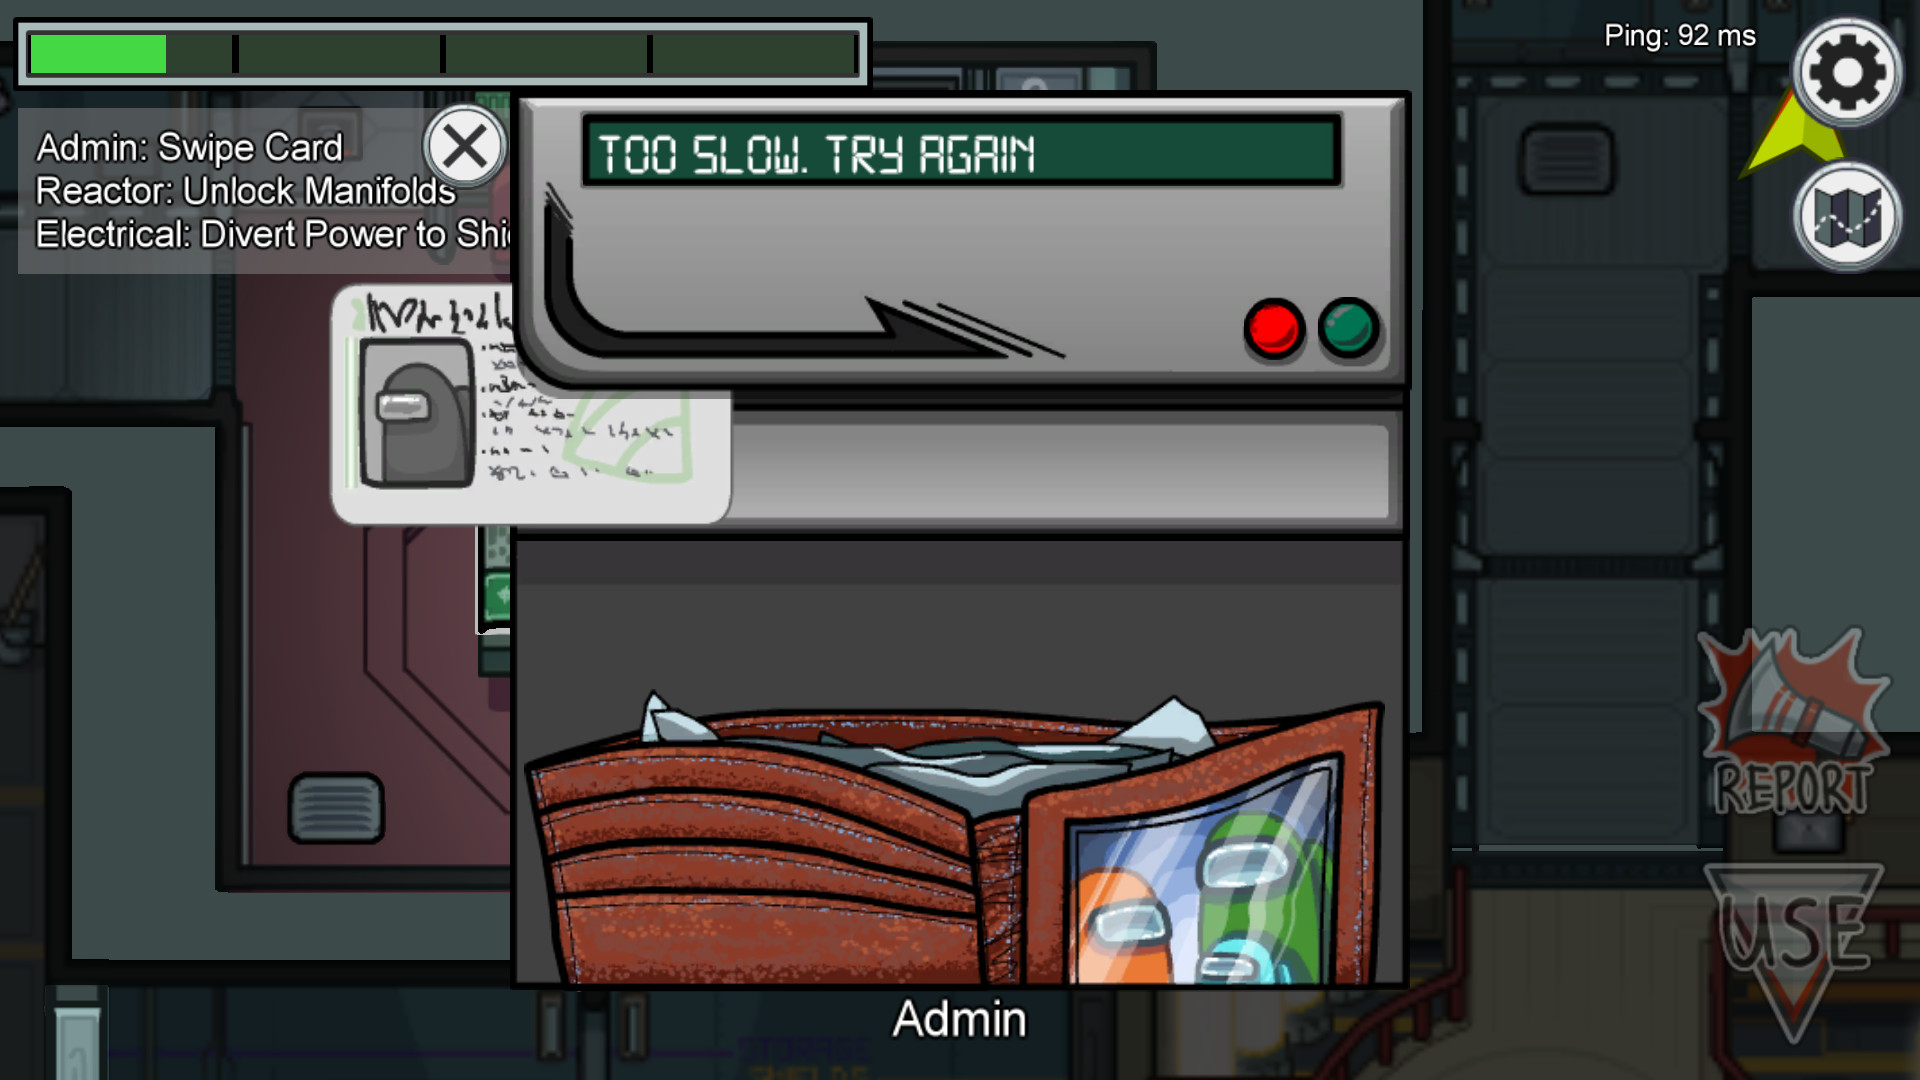 Скриншот из игры Among Us